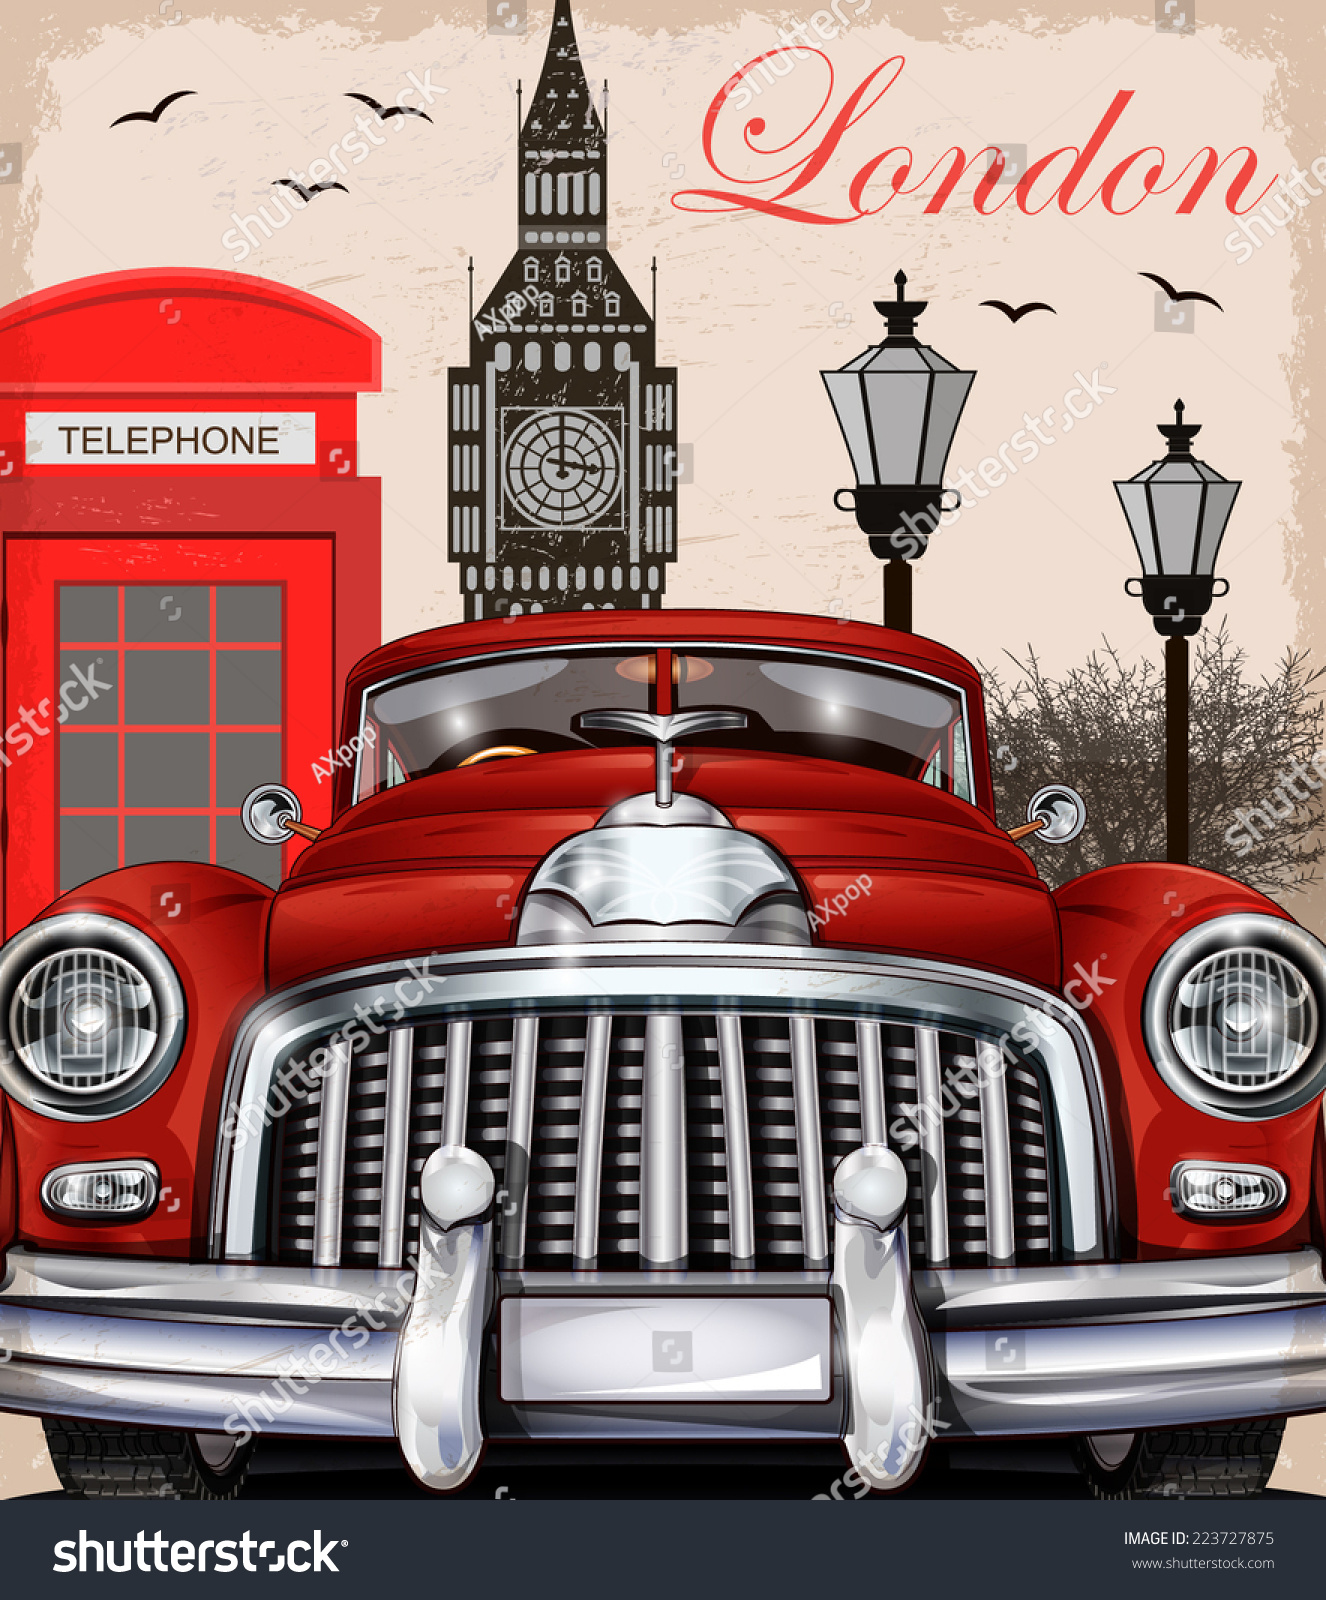 London retro poster stock vector 223727875 shutterstock for Imagenes retro vintage